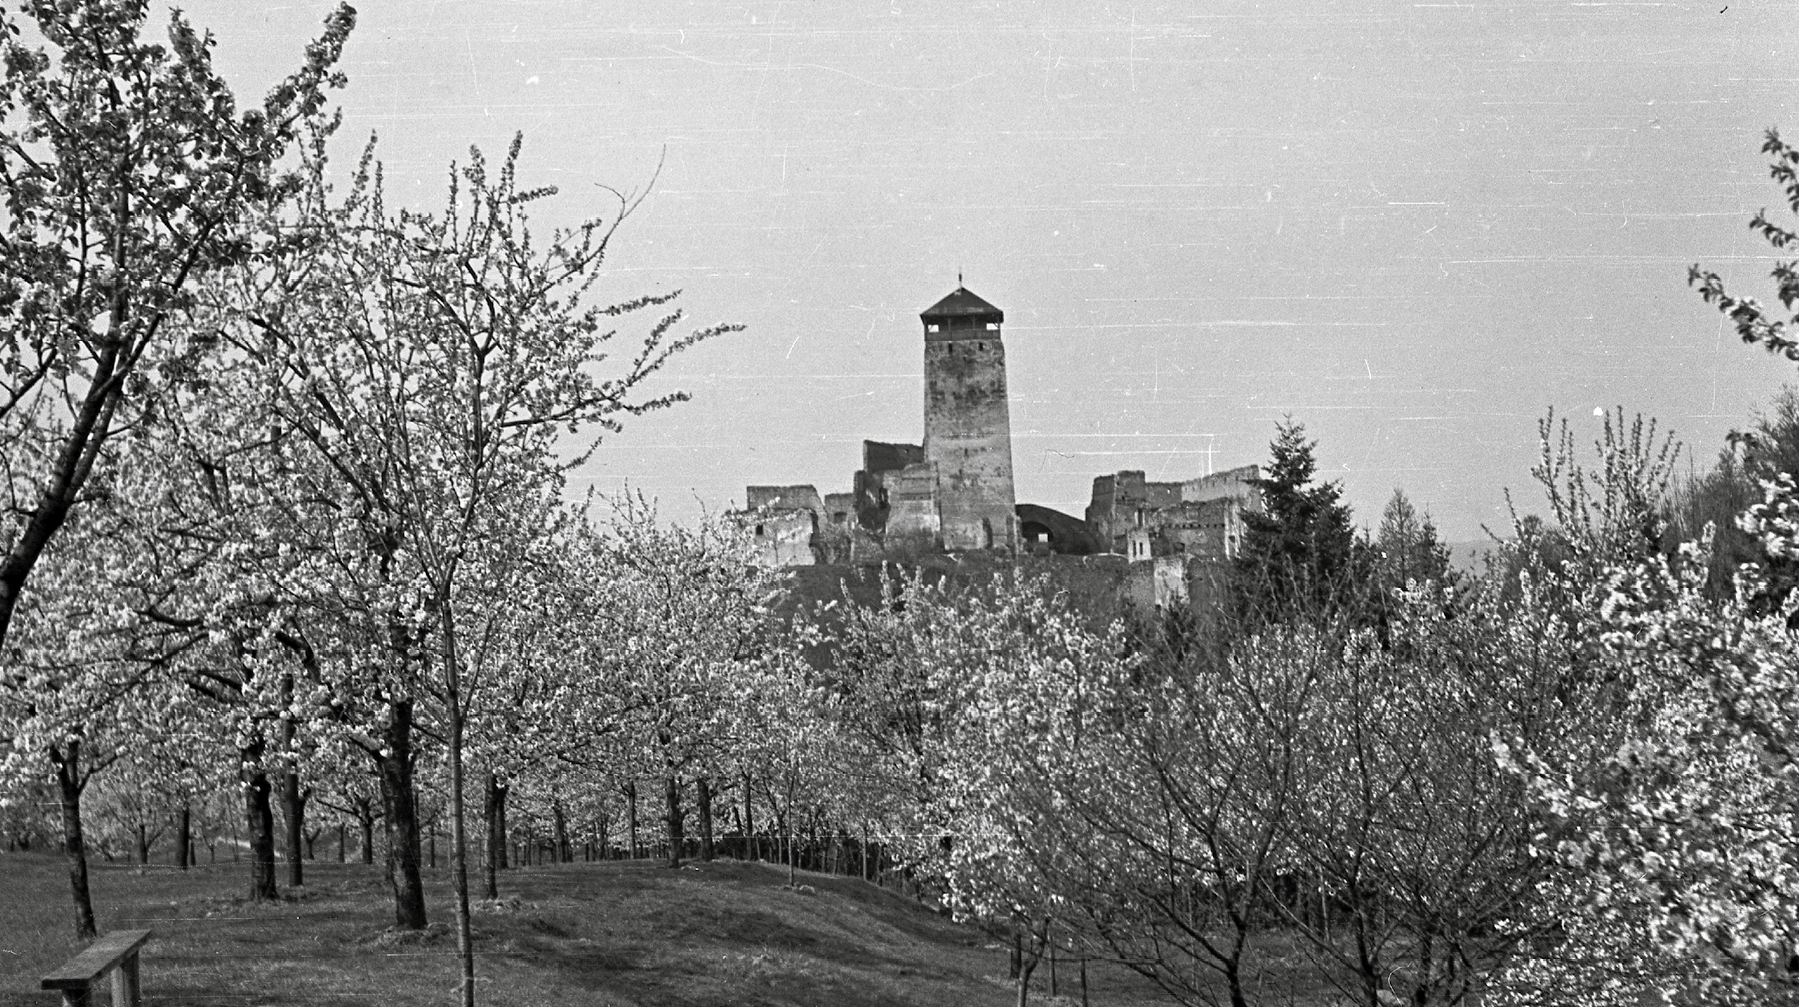 Foto Štefana Pozdišovského z roku 1952